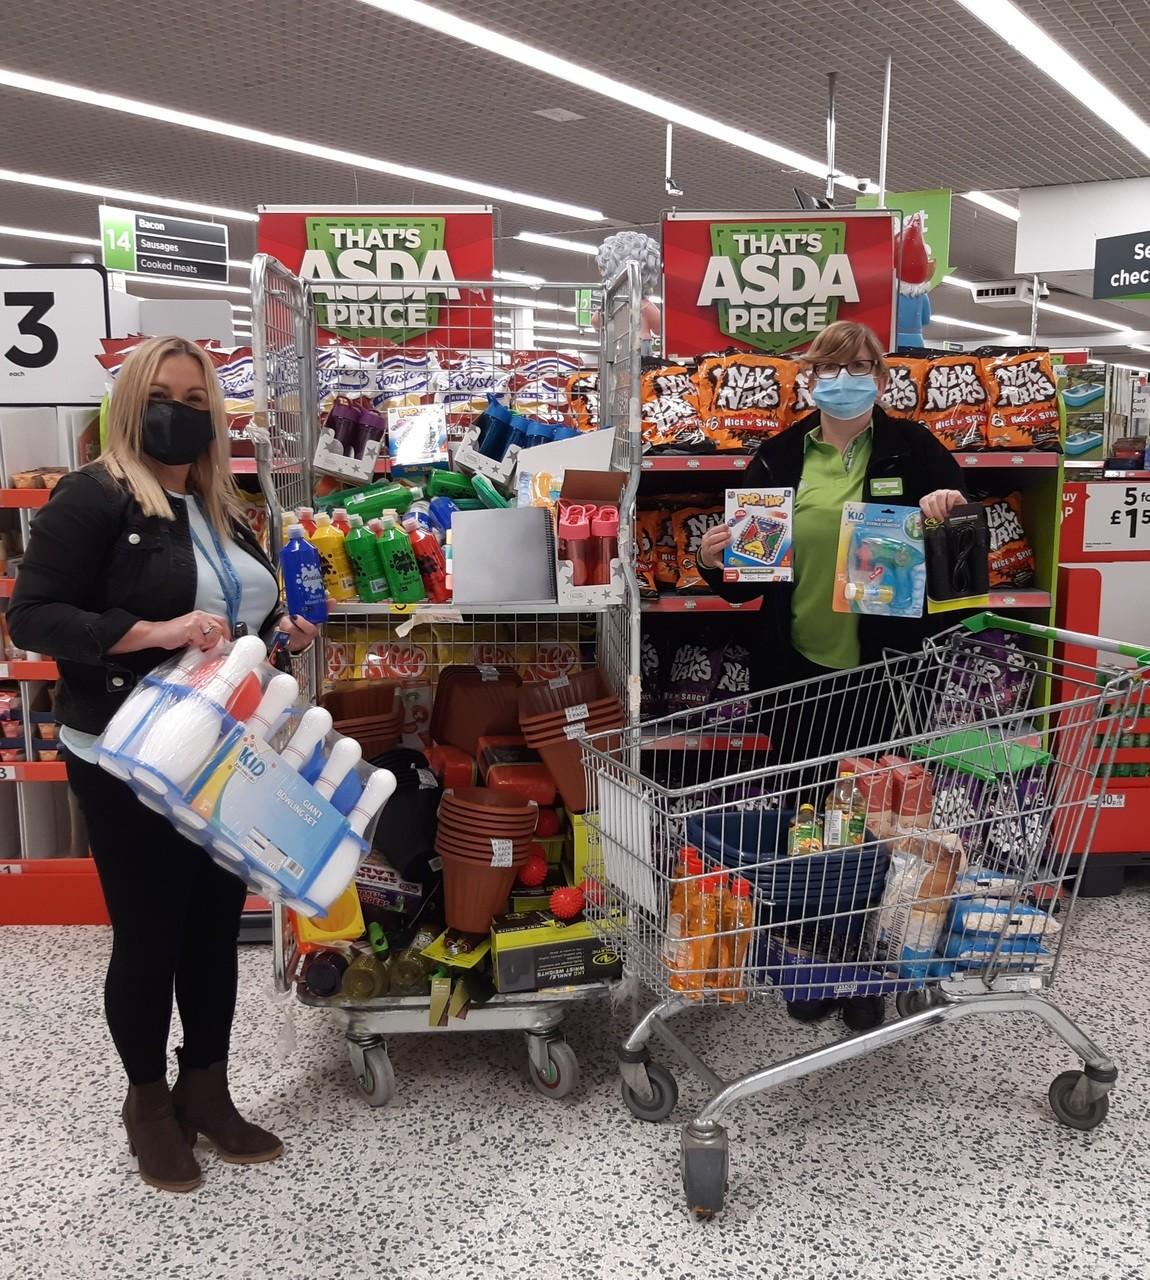 Asda Foundation Supporting Communities Grant Donation | Asda Kirkcaldy